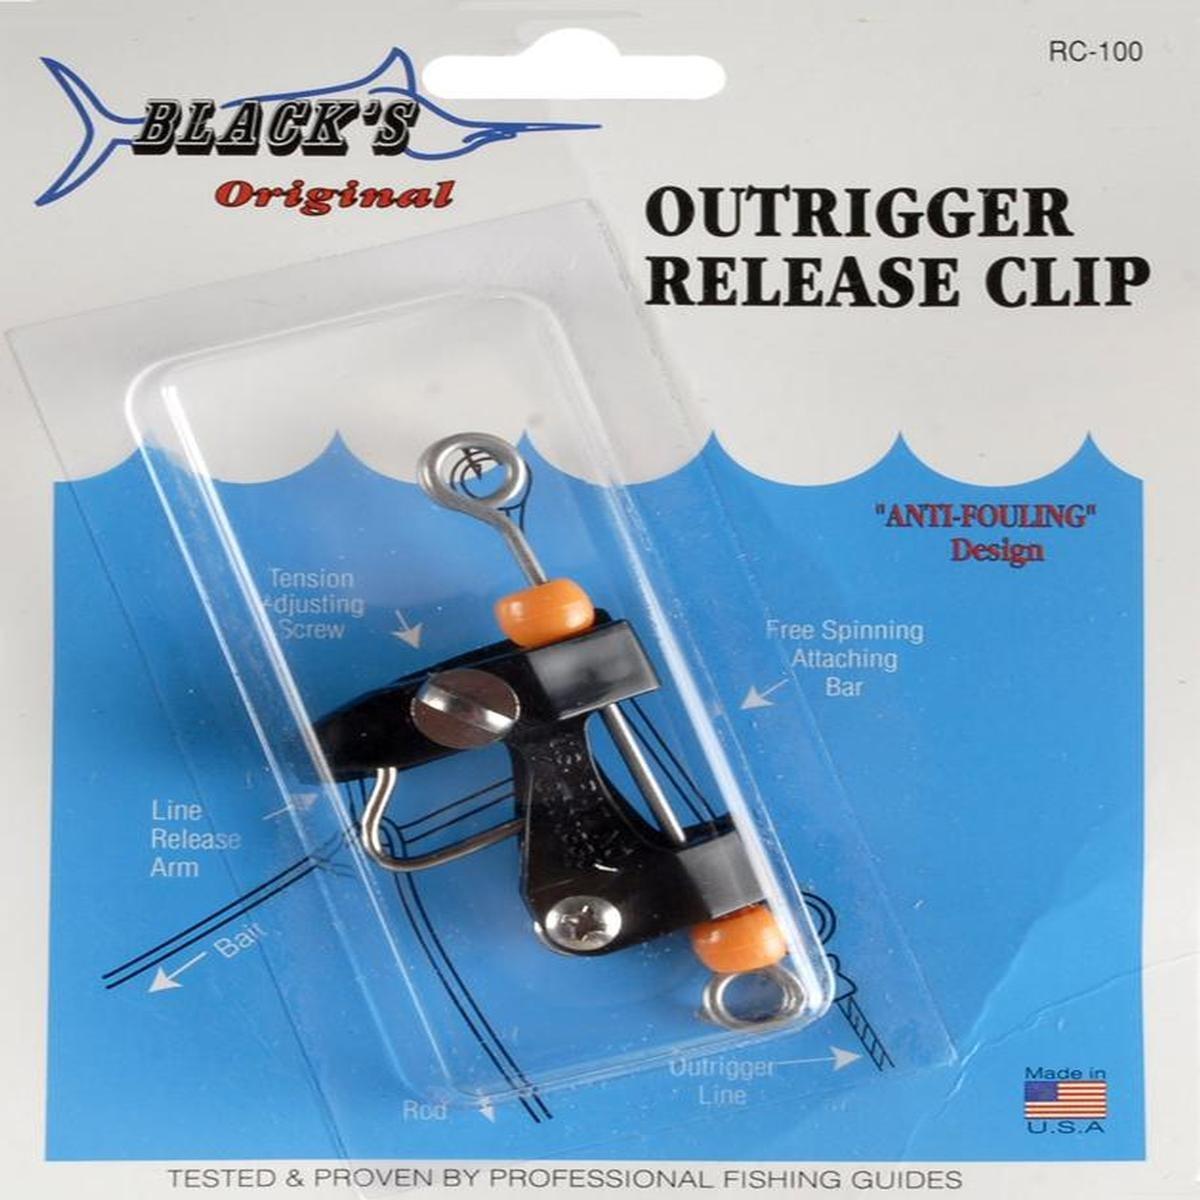 Blacks Outrigger Release Clip